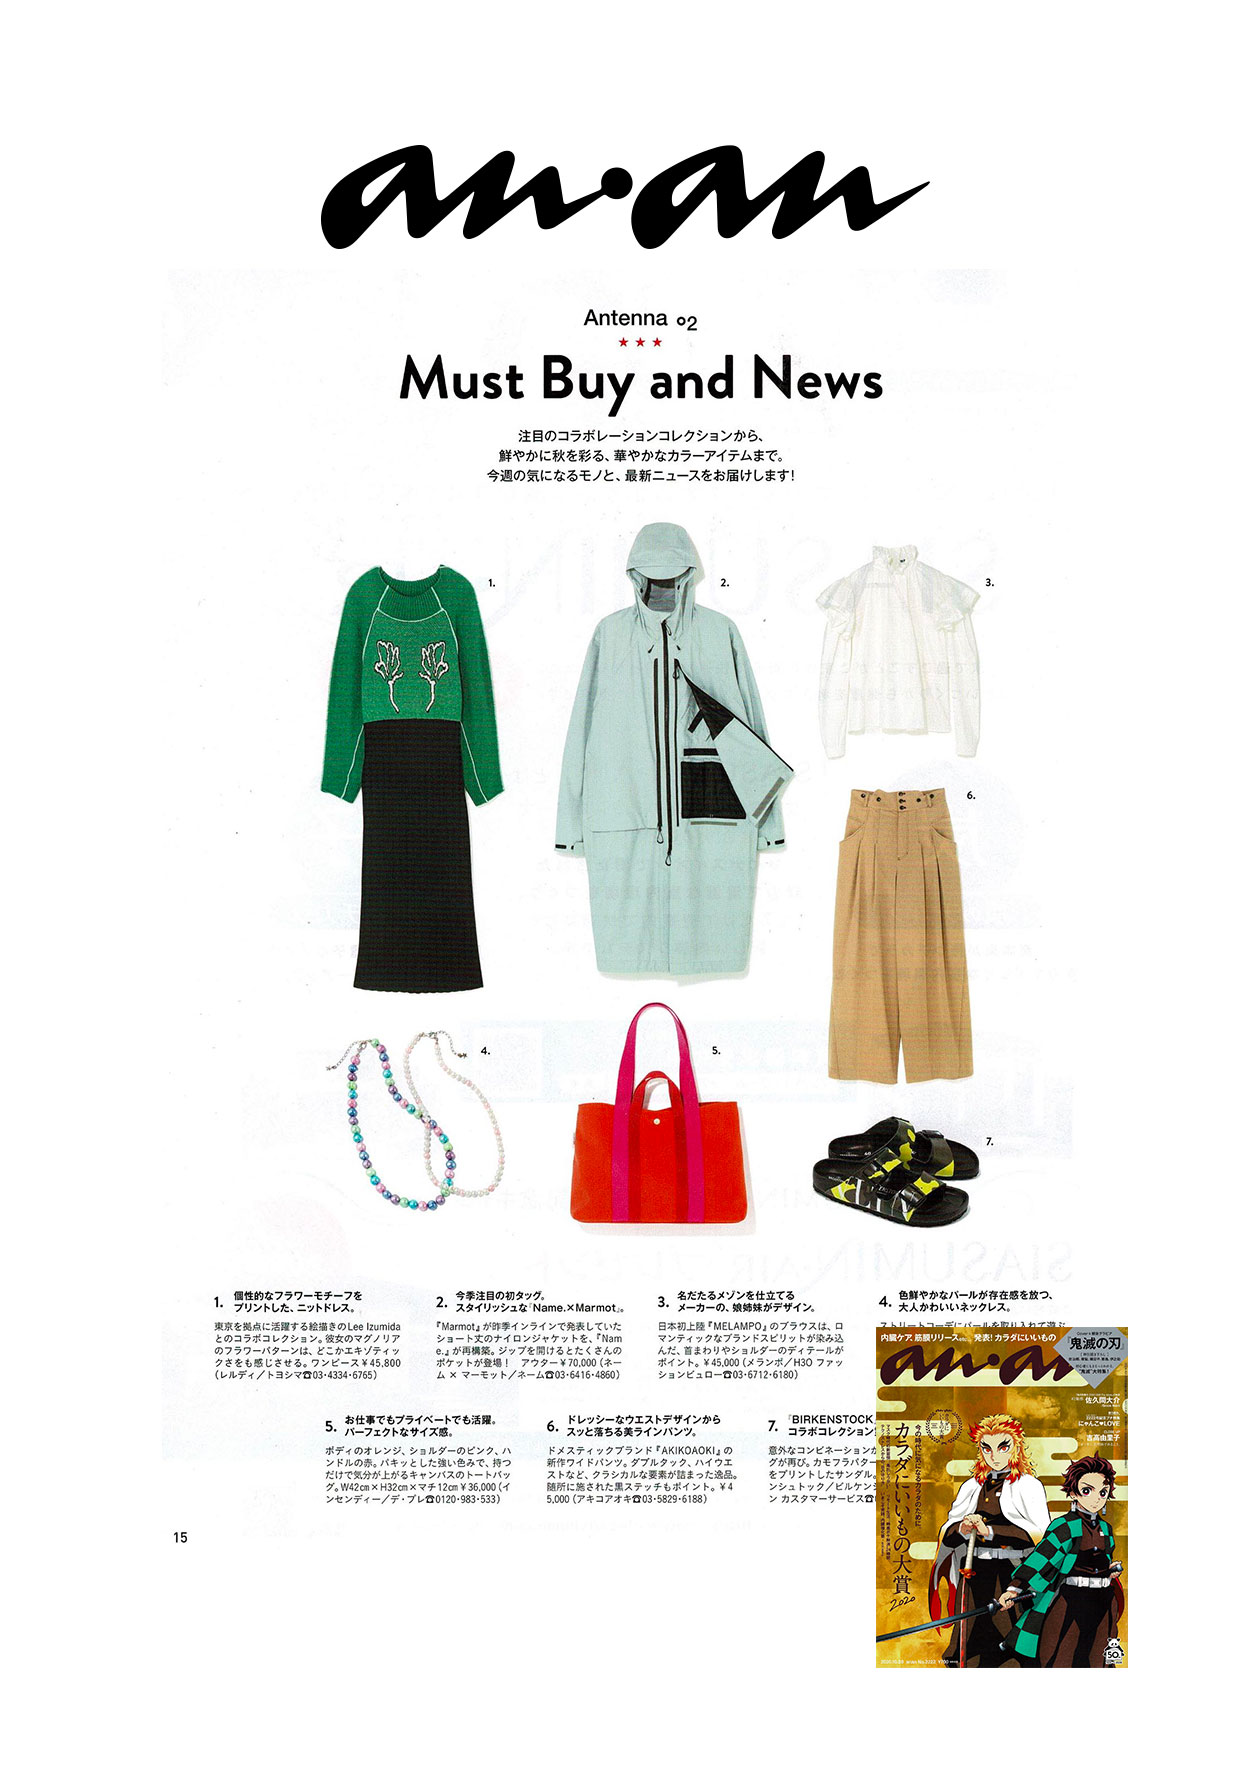 melampo-press-anan-magazine